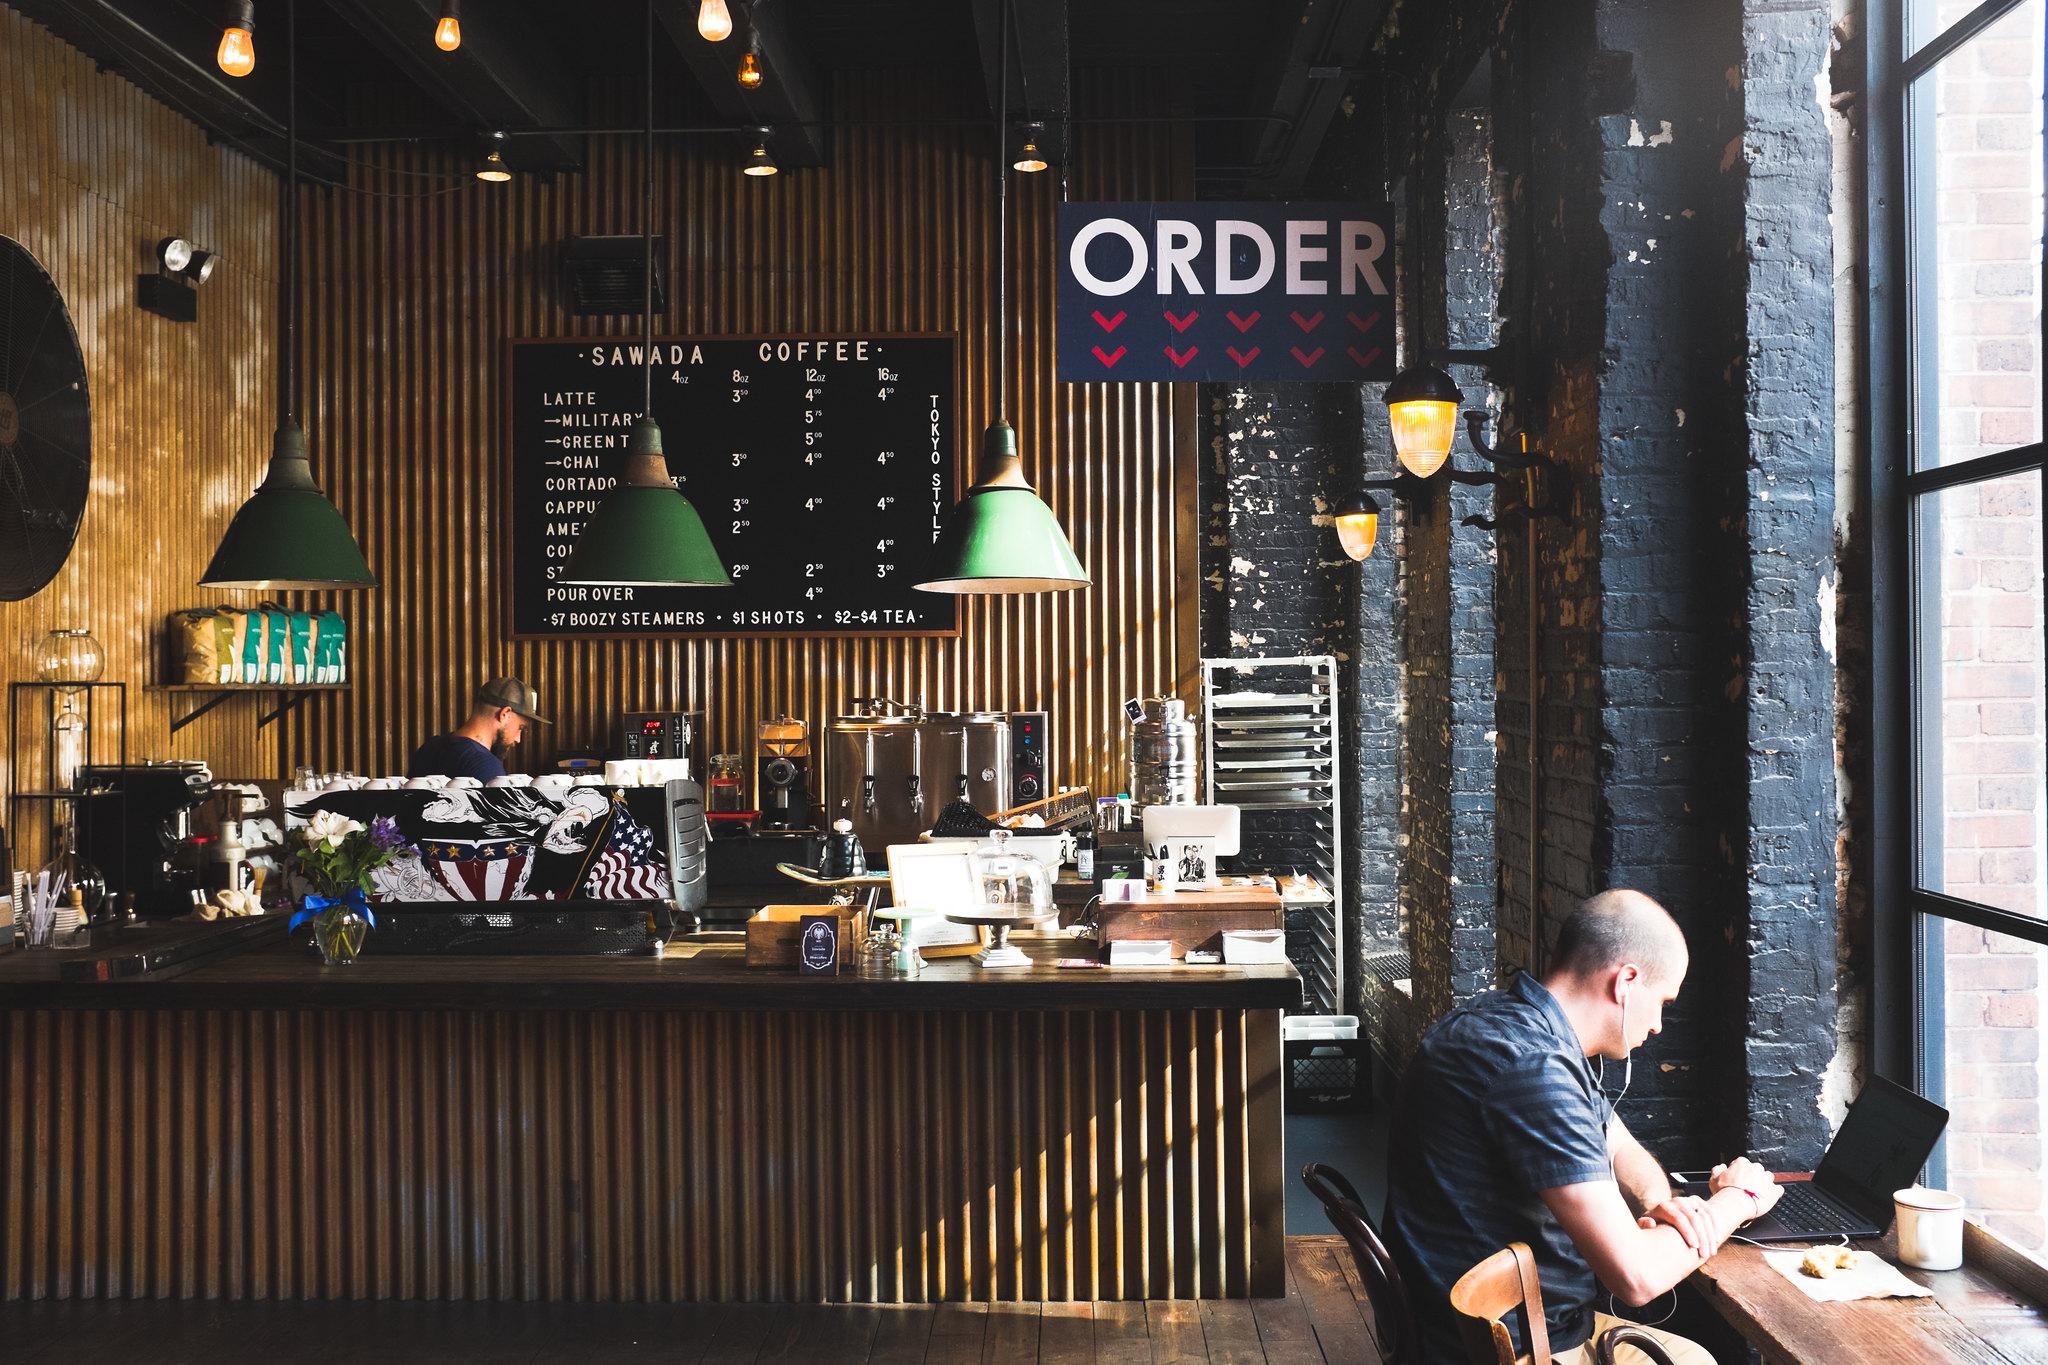 Sawada coffee shop in Chicago's West Loop neighborhood